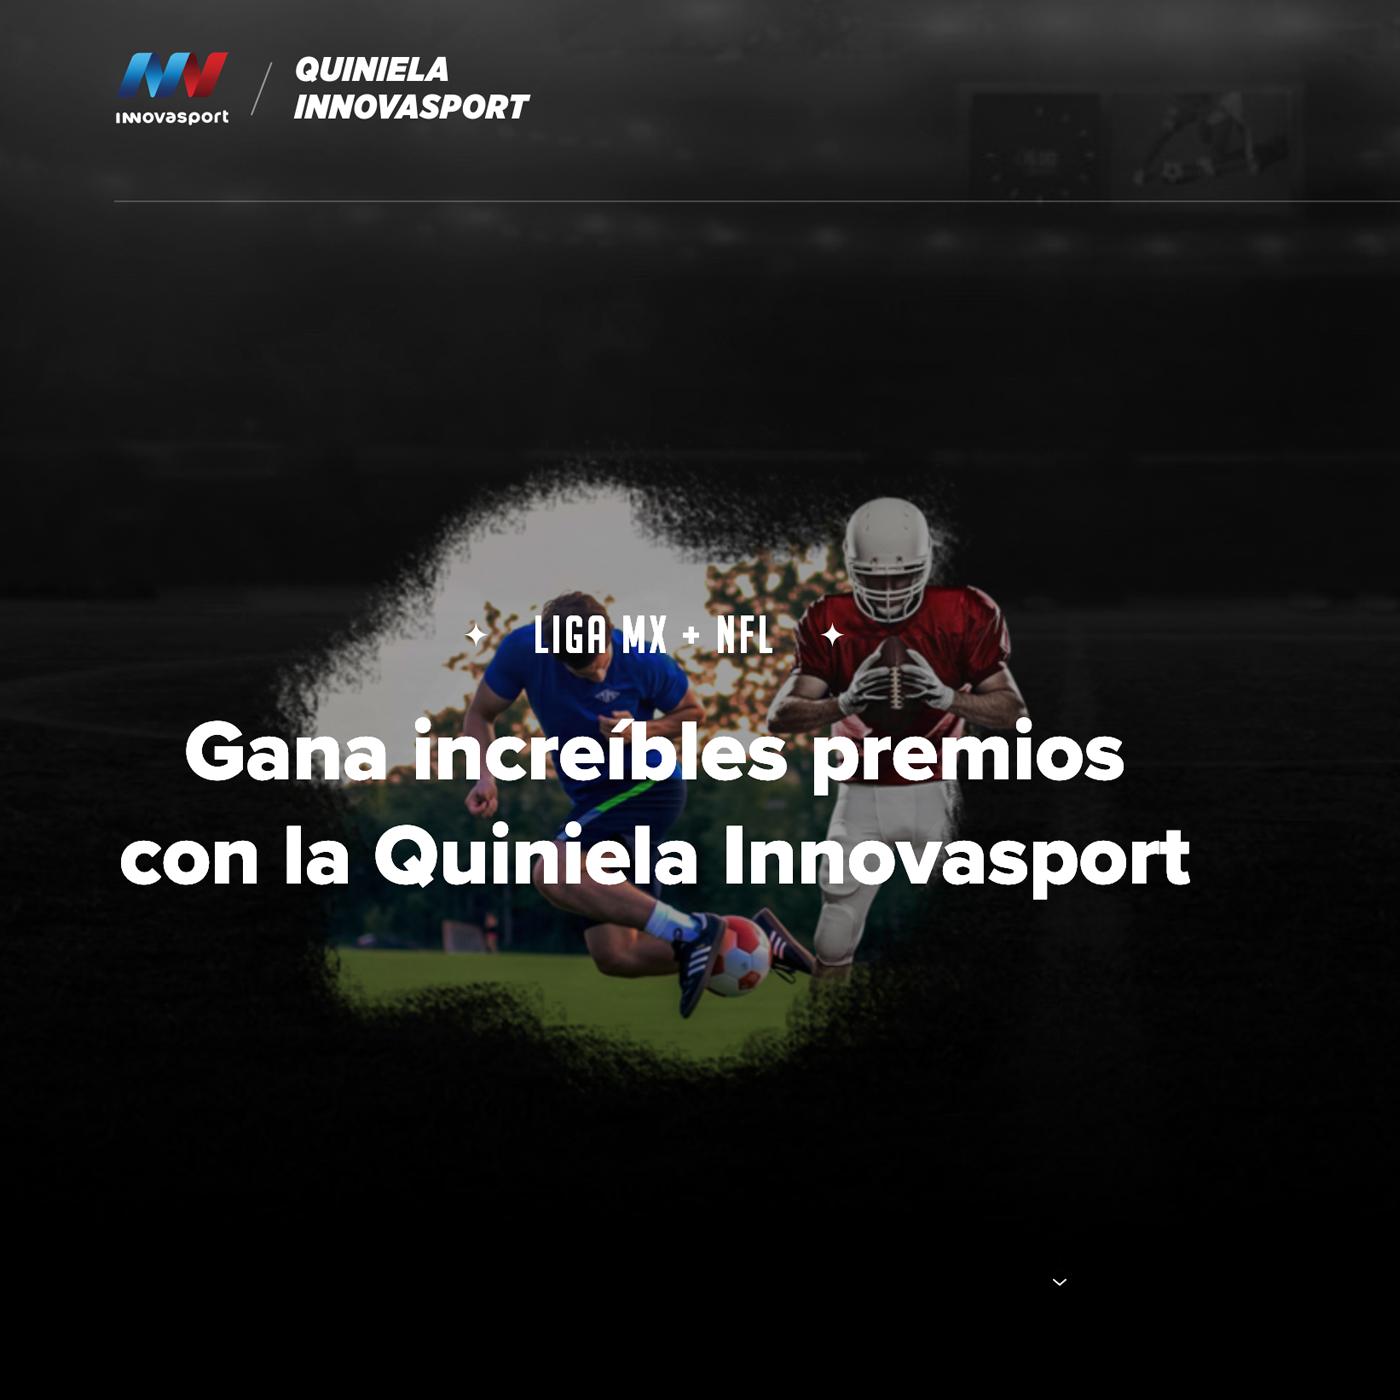 Quiniela Innova Sport